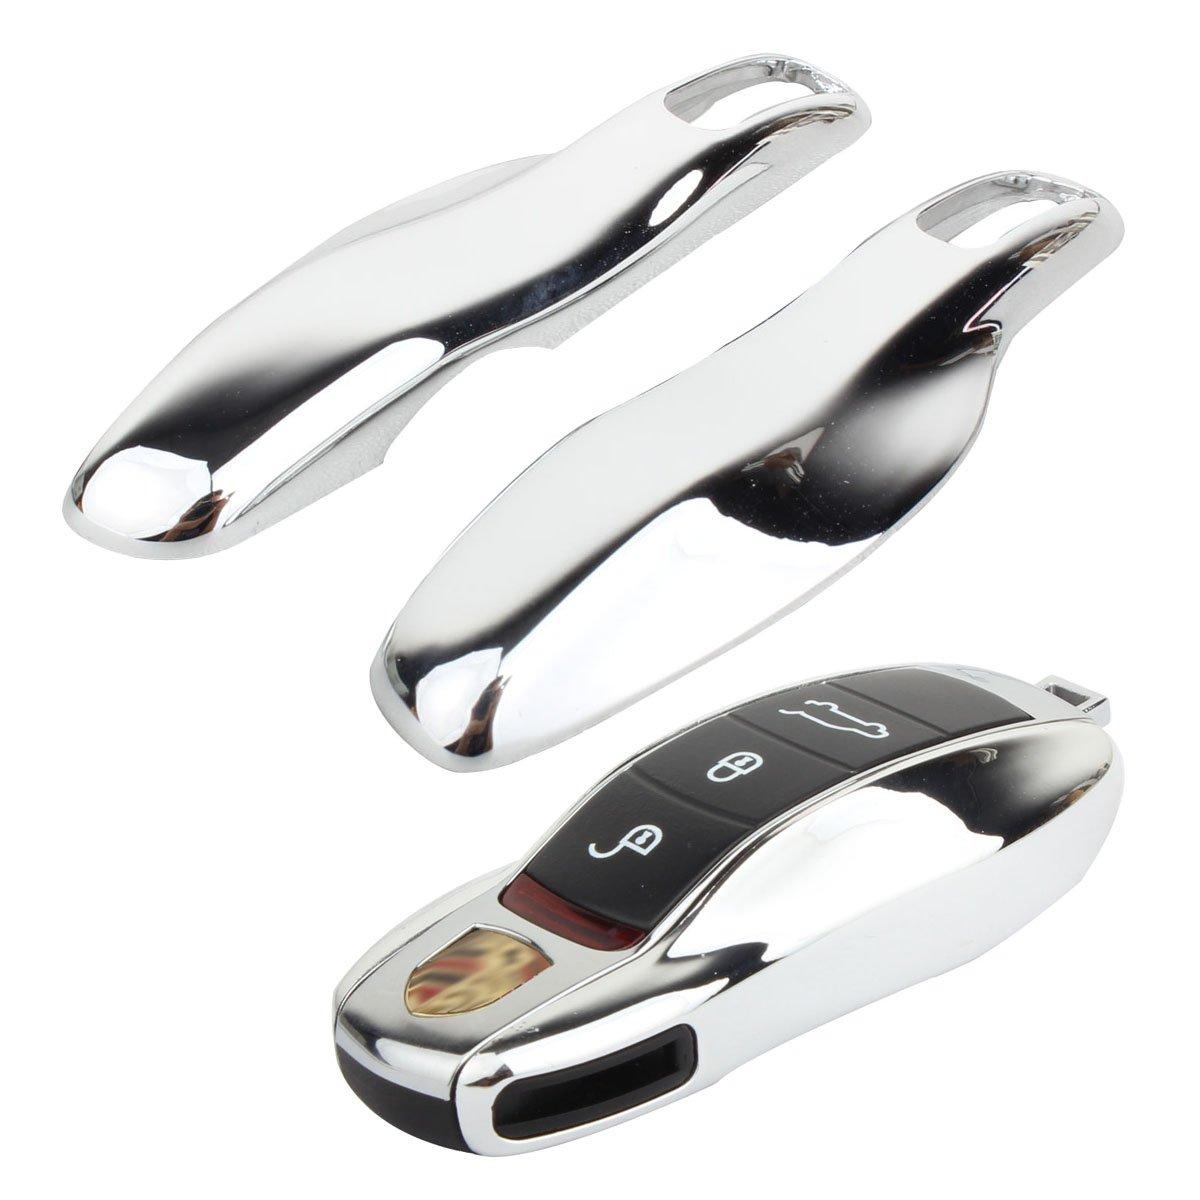 TOMALL Reemplazo Clave Cubierta Plata Chapado Cromo para Porsche Cayenne Panamera Macan 911 Carrera Clave Caja de Shell